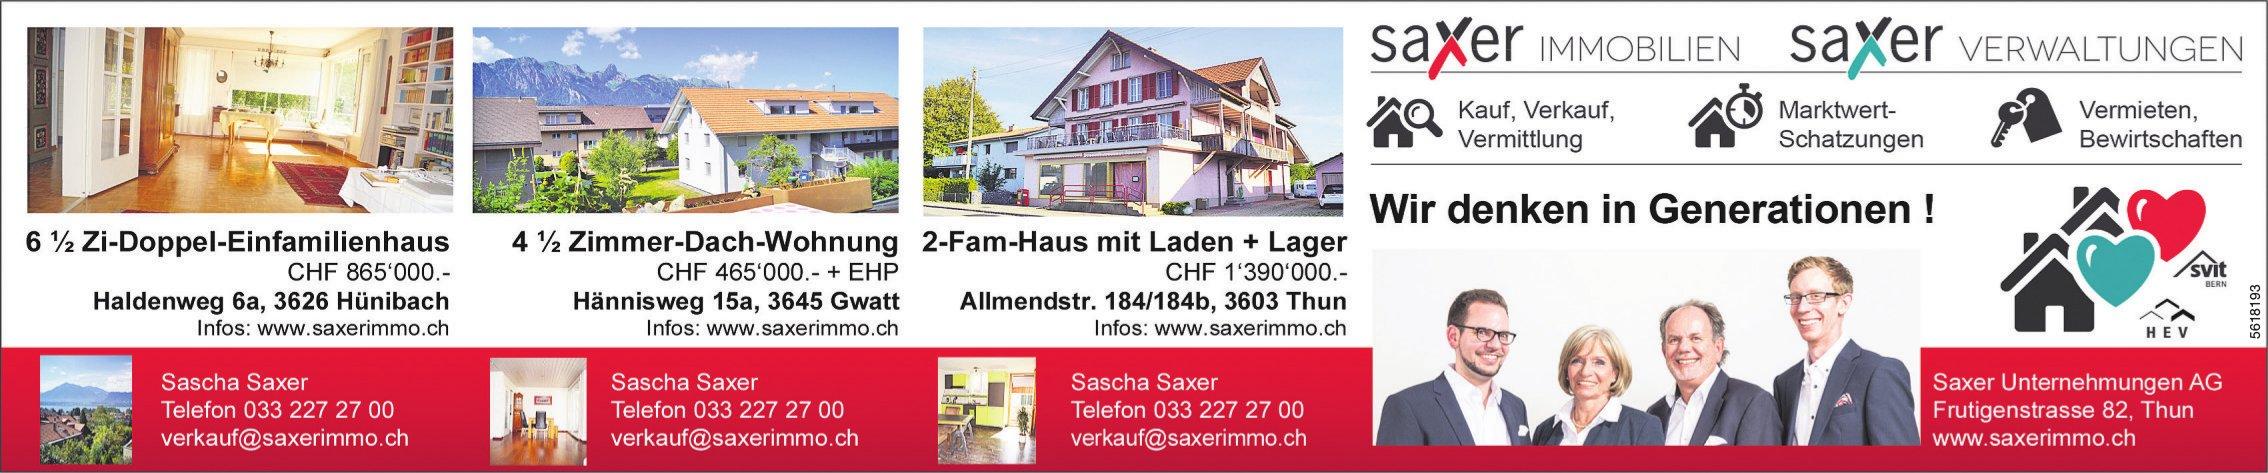 Saxer Unternehmungen AG - Immobiliensbulletin